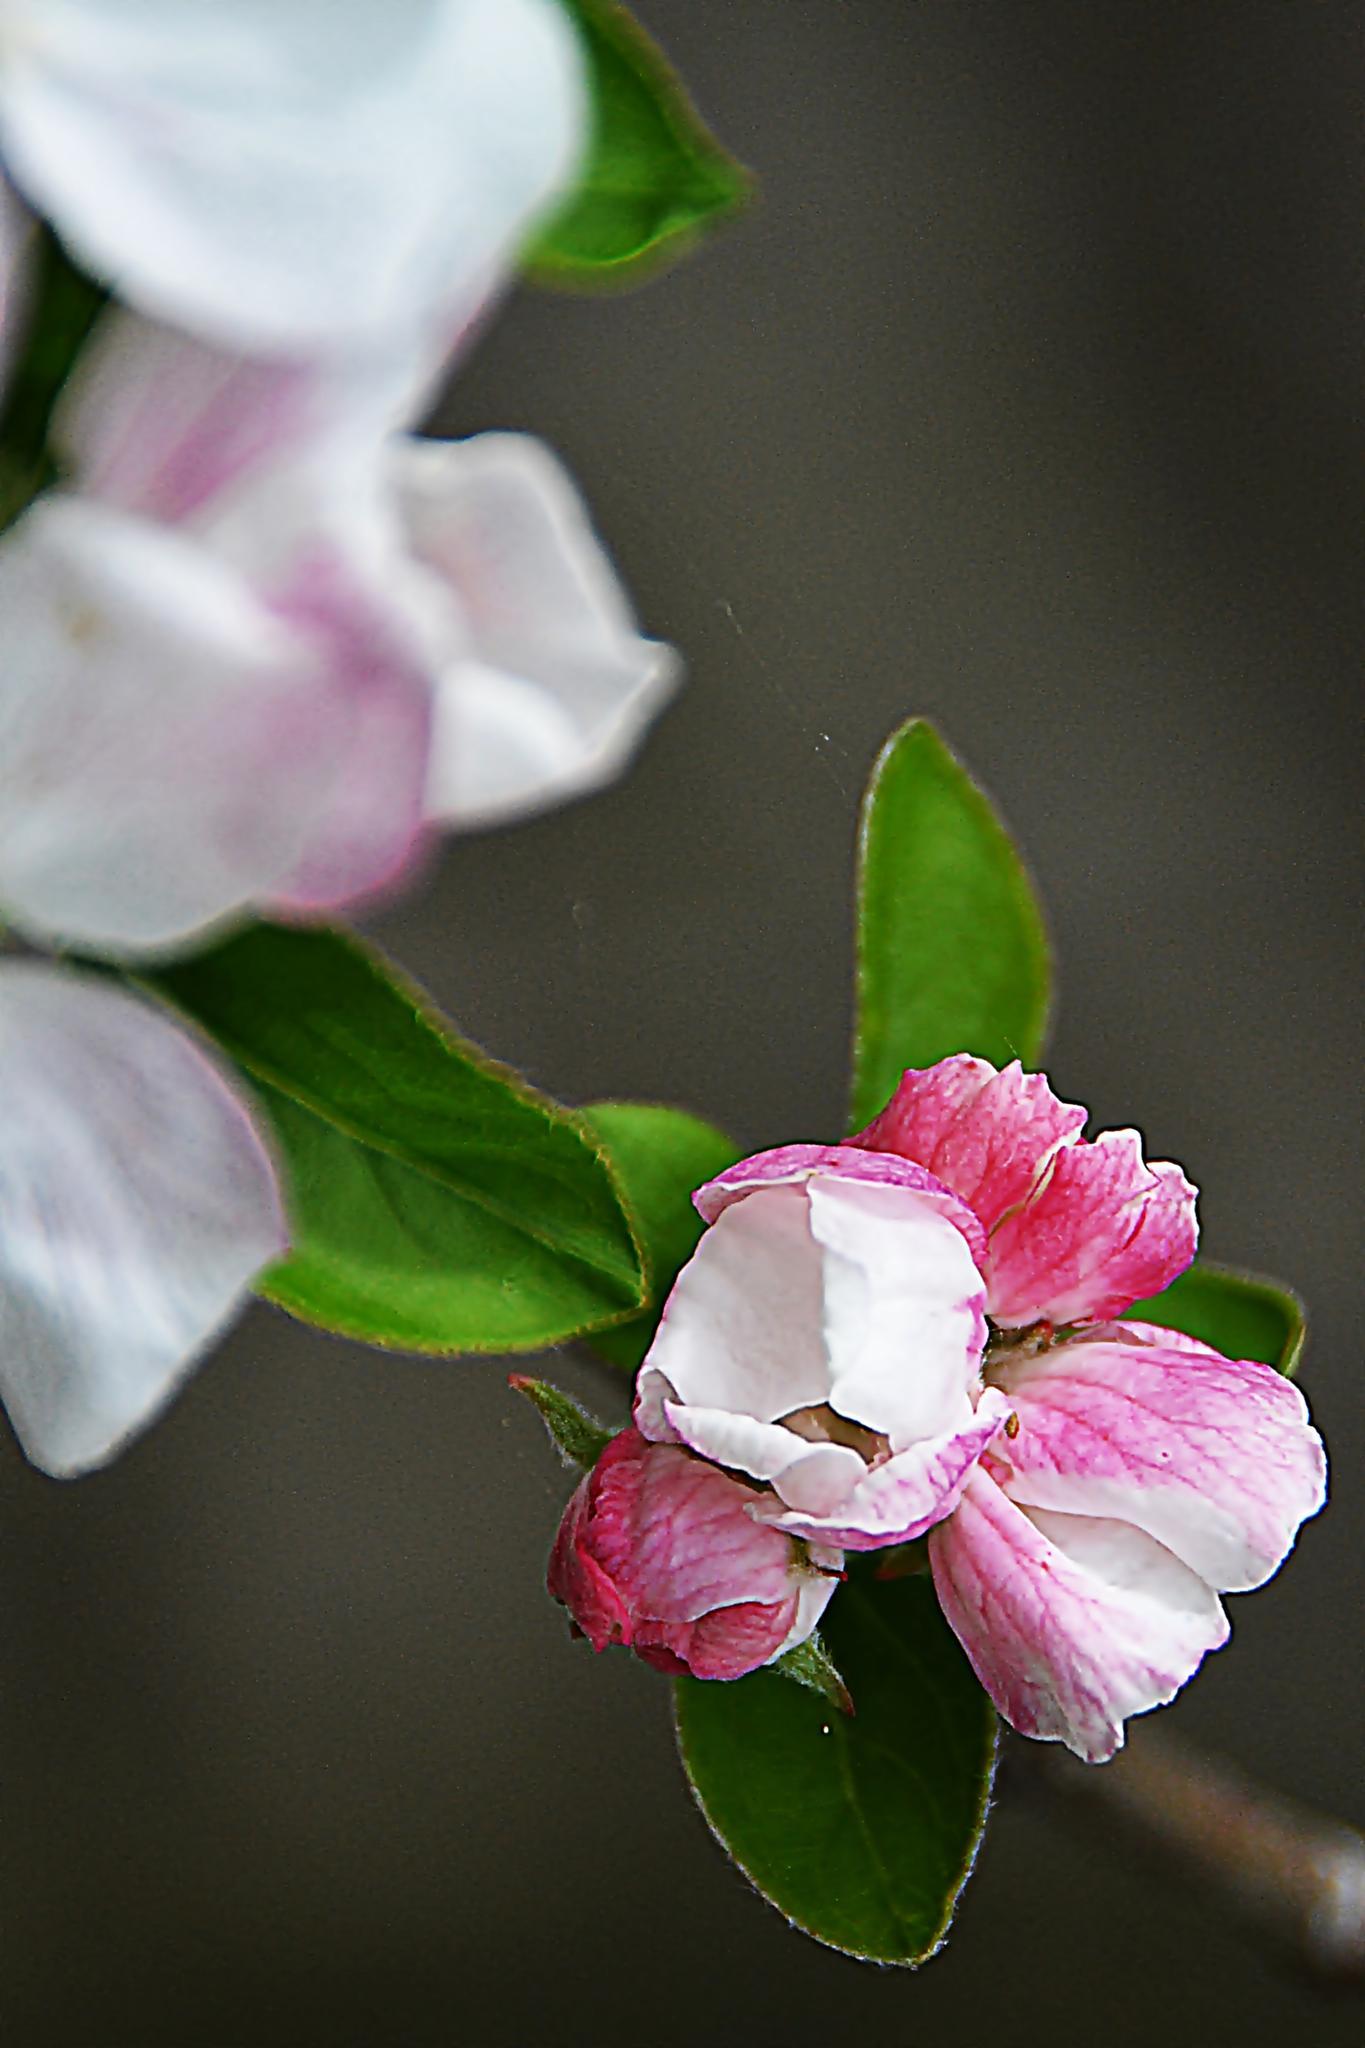 Budding flower by Antonio Pronto